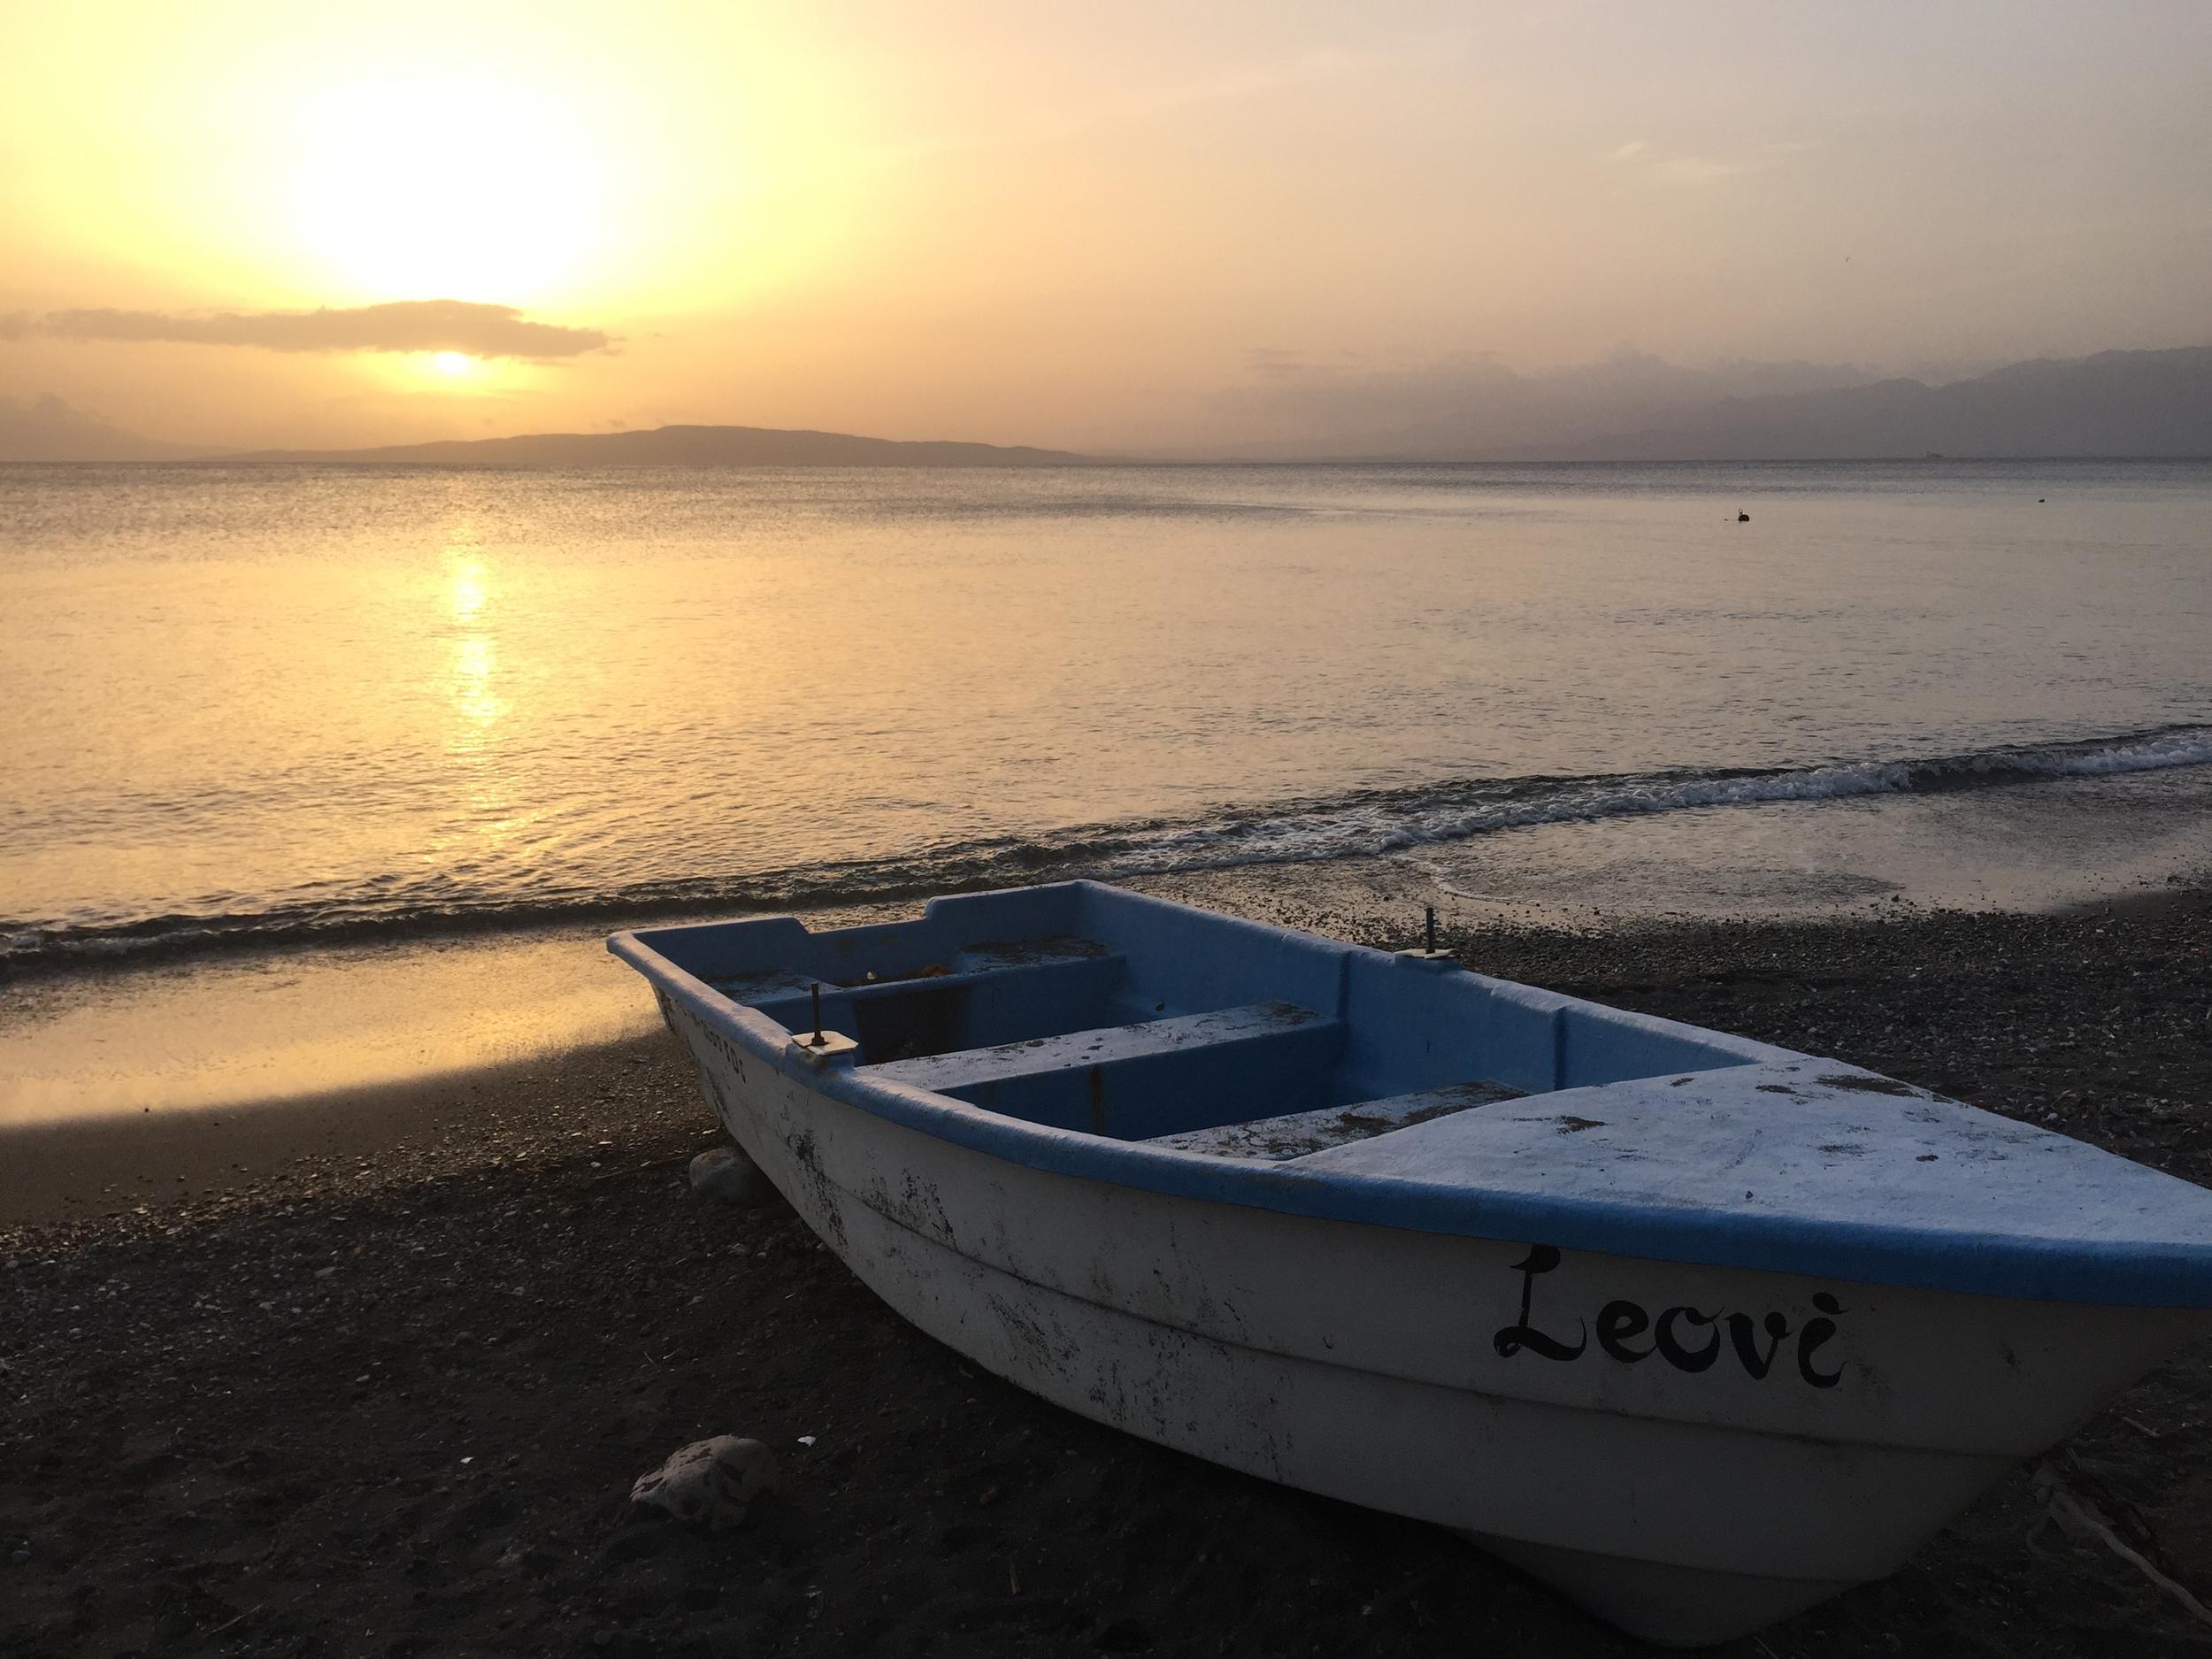 Sunset at the Beach: Palmar De Ocoa